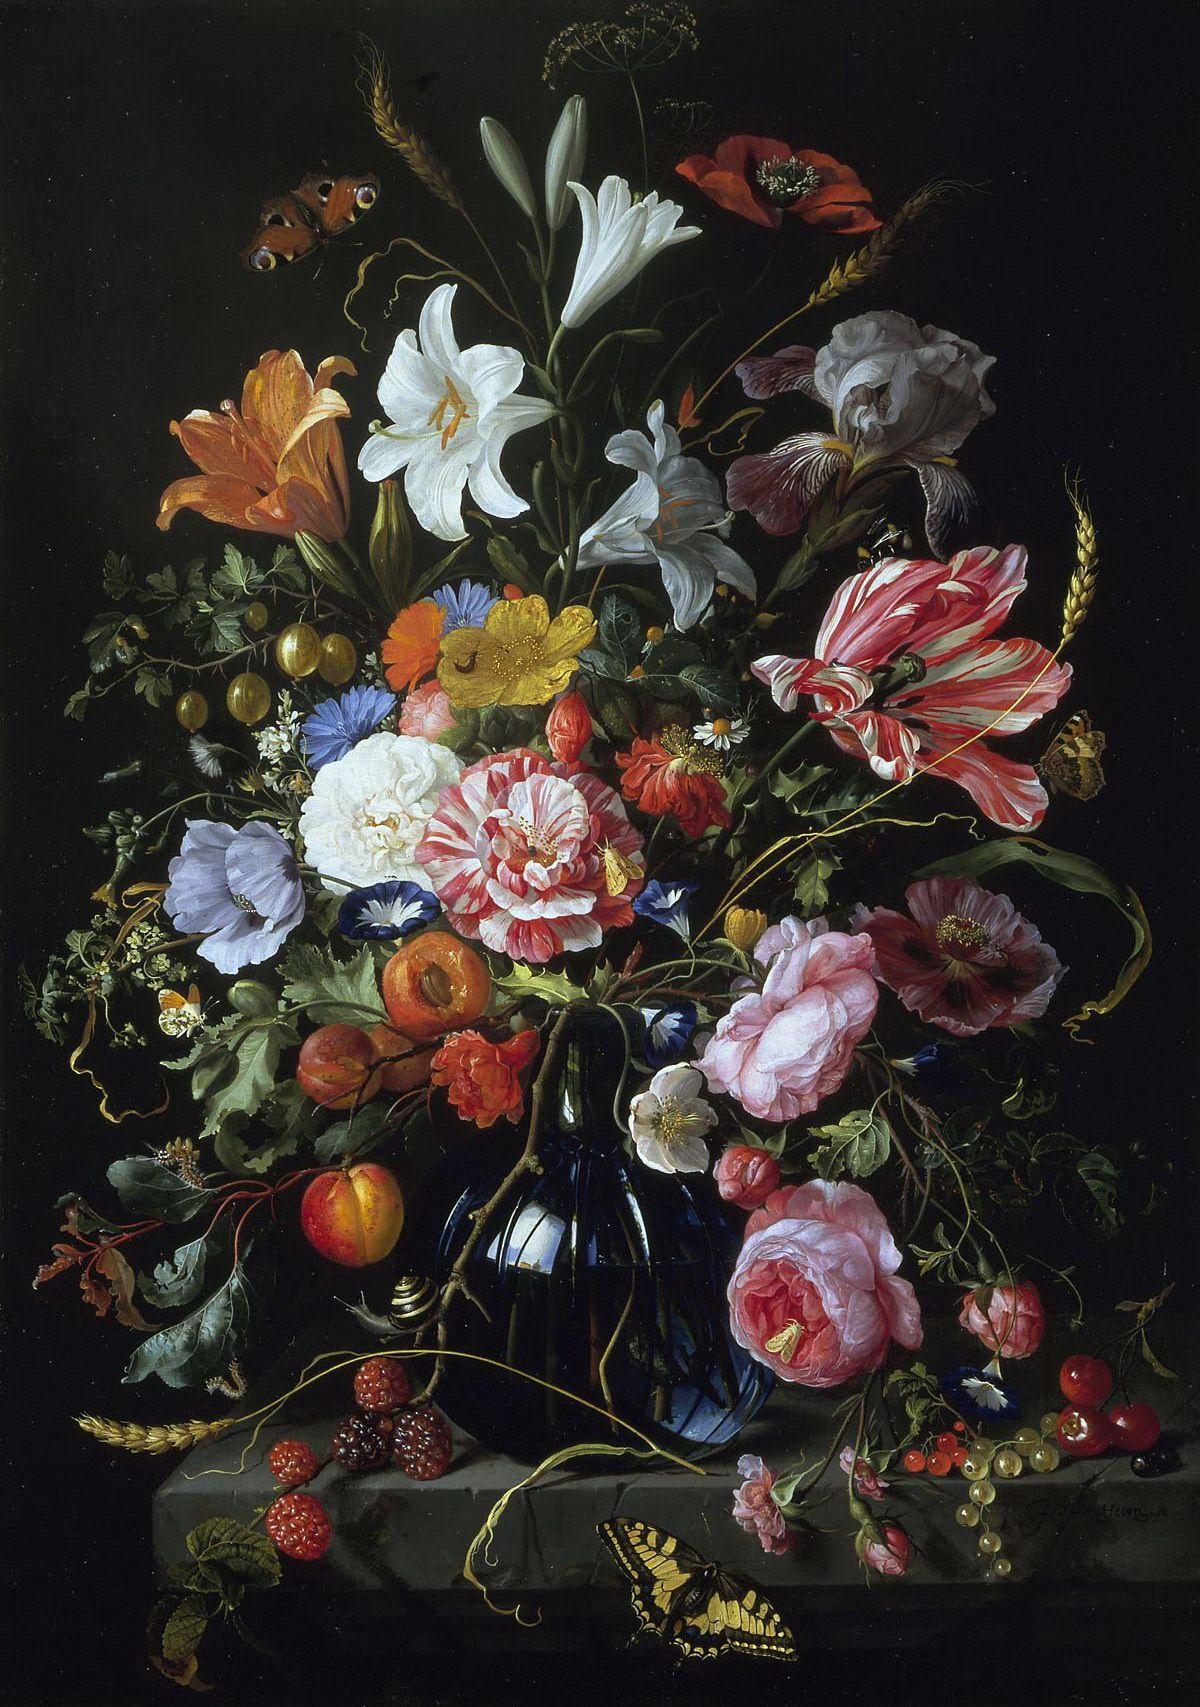 Www Oceansbridge Ca Paintings Collections Dutch Flemish Still Life Jan 20davidsz 20de 20heem 20 1606 20 2 Flower Painting Floral Painting Still Life Painting